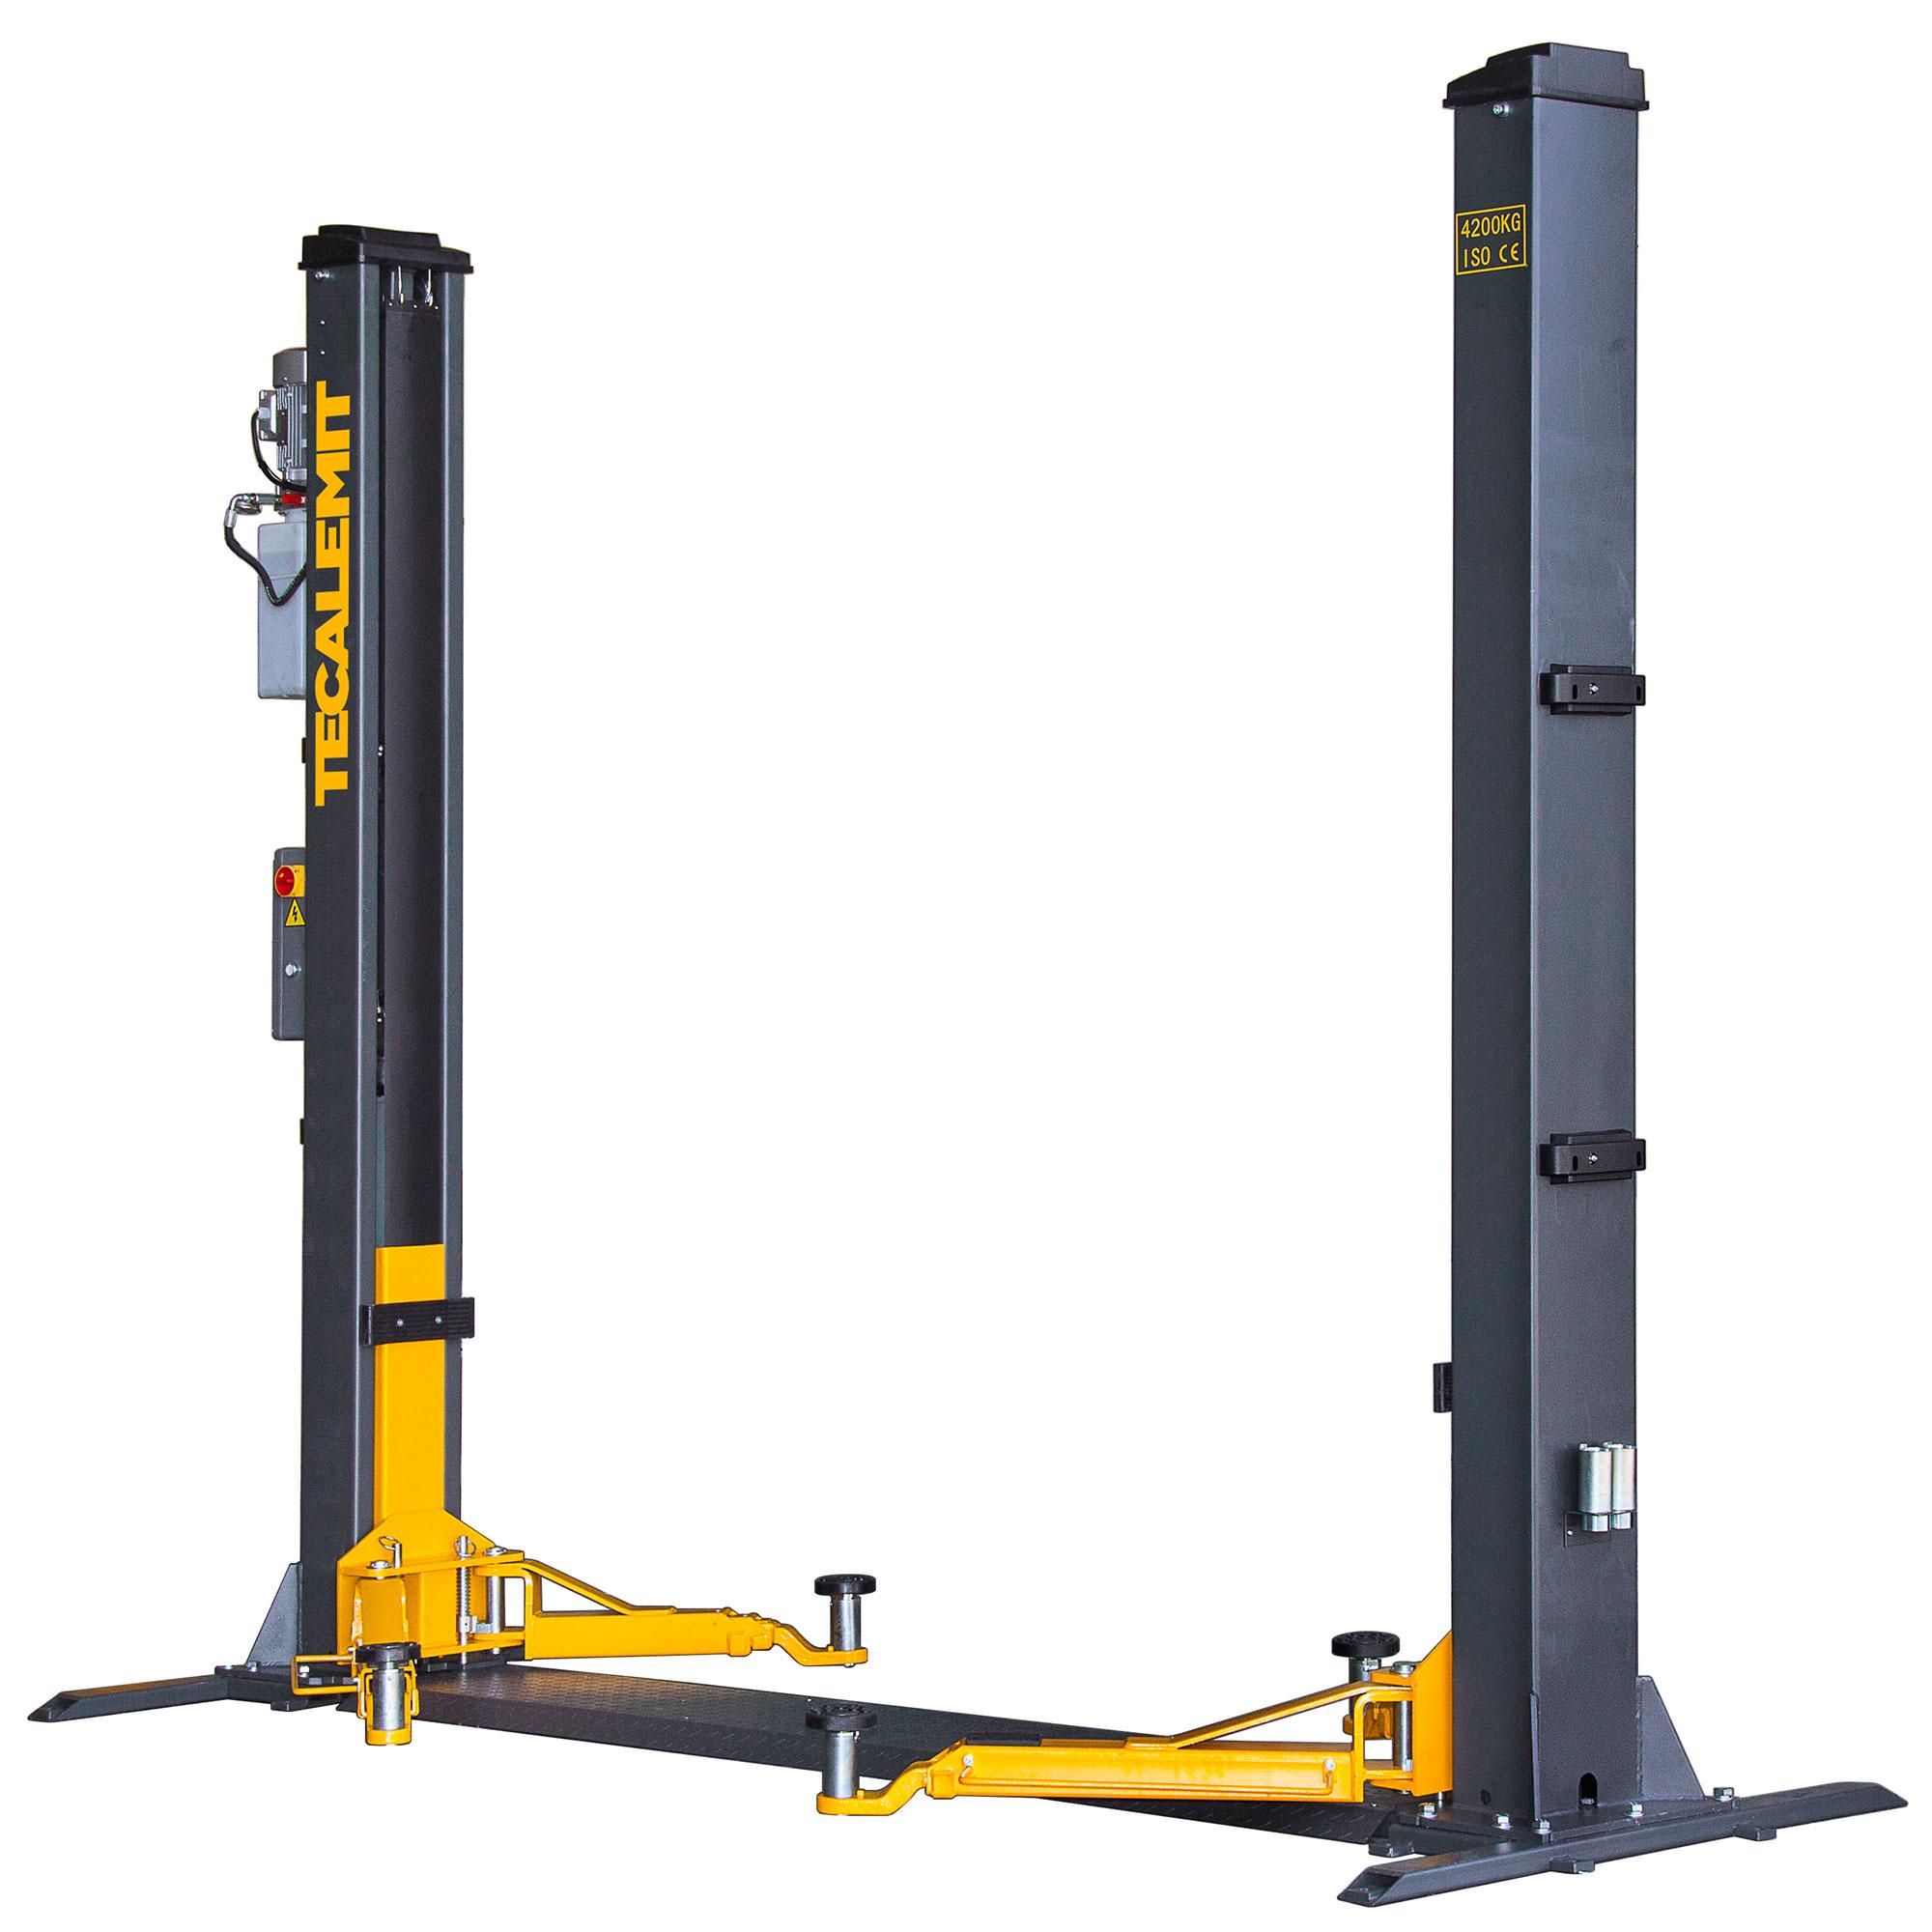 TECB242 - 4.2 Tonne 2 Post Base Plate Hoist